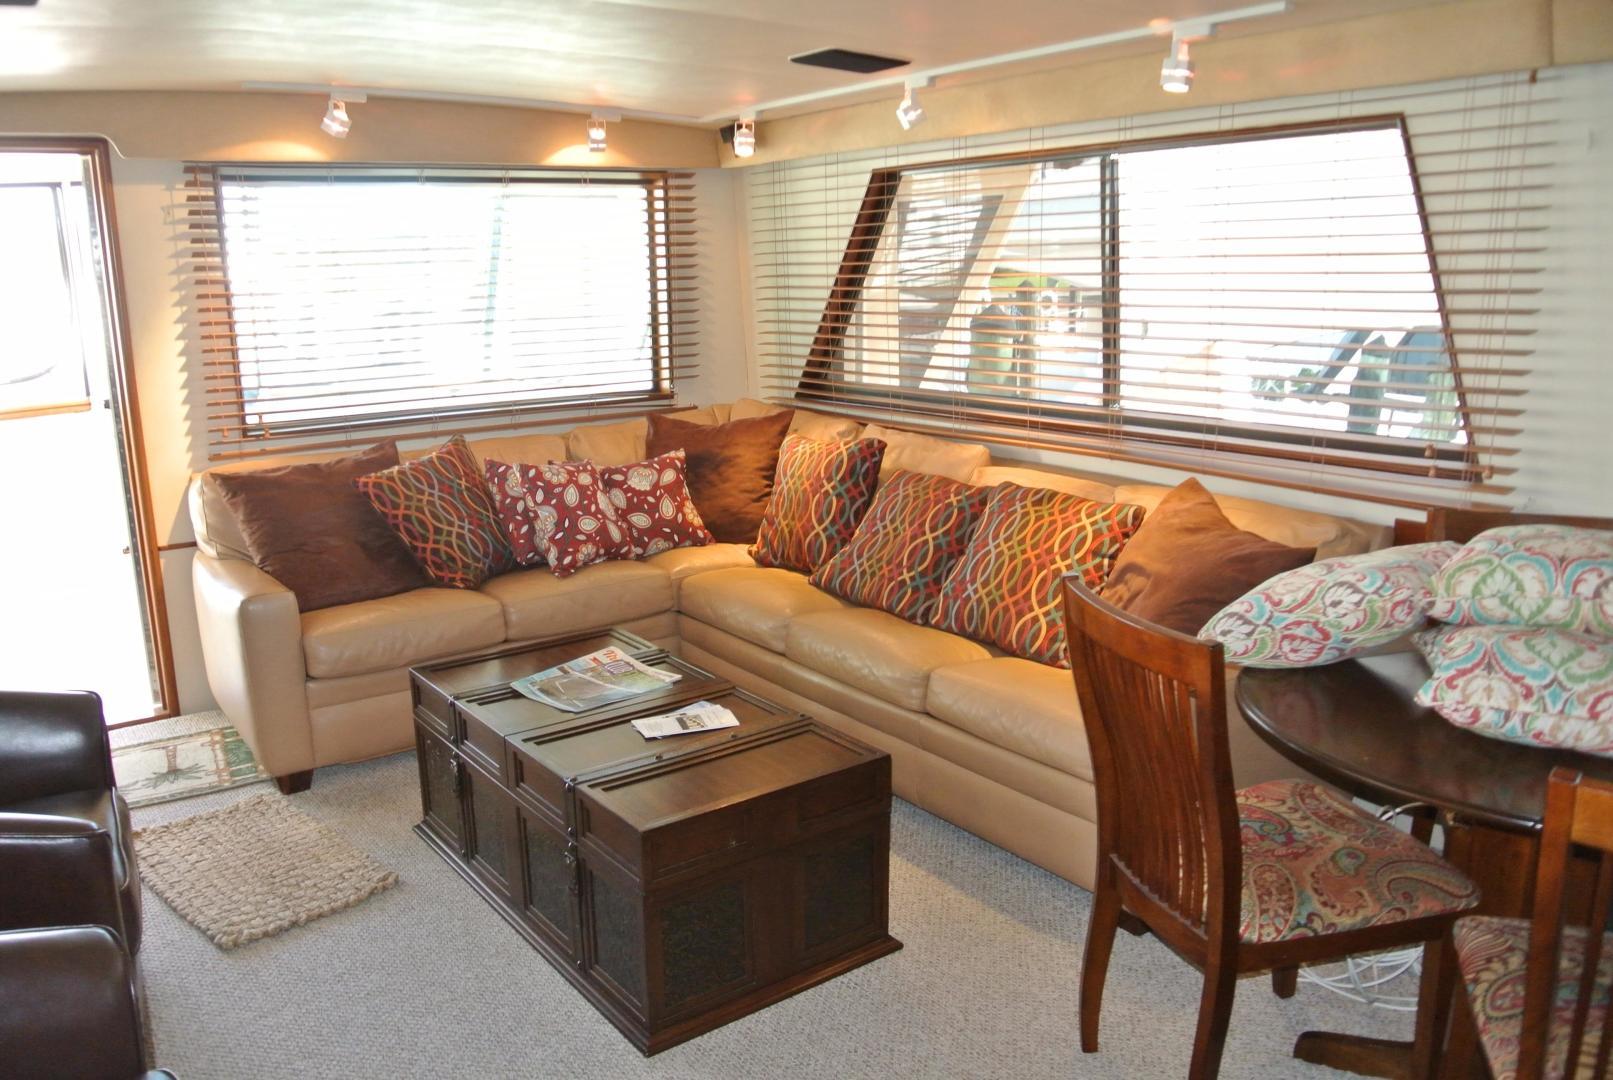 Hatteras-67 Cockpit Motor Yacht 1988-Lady Encore Saint Petersburg-Florida-United States-Salon-926190 | Thumbnail